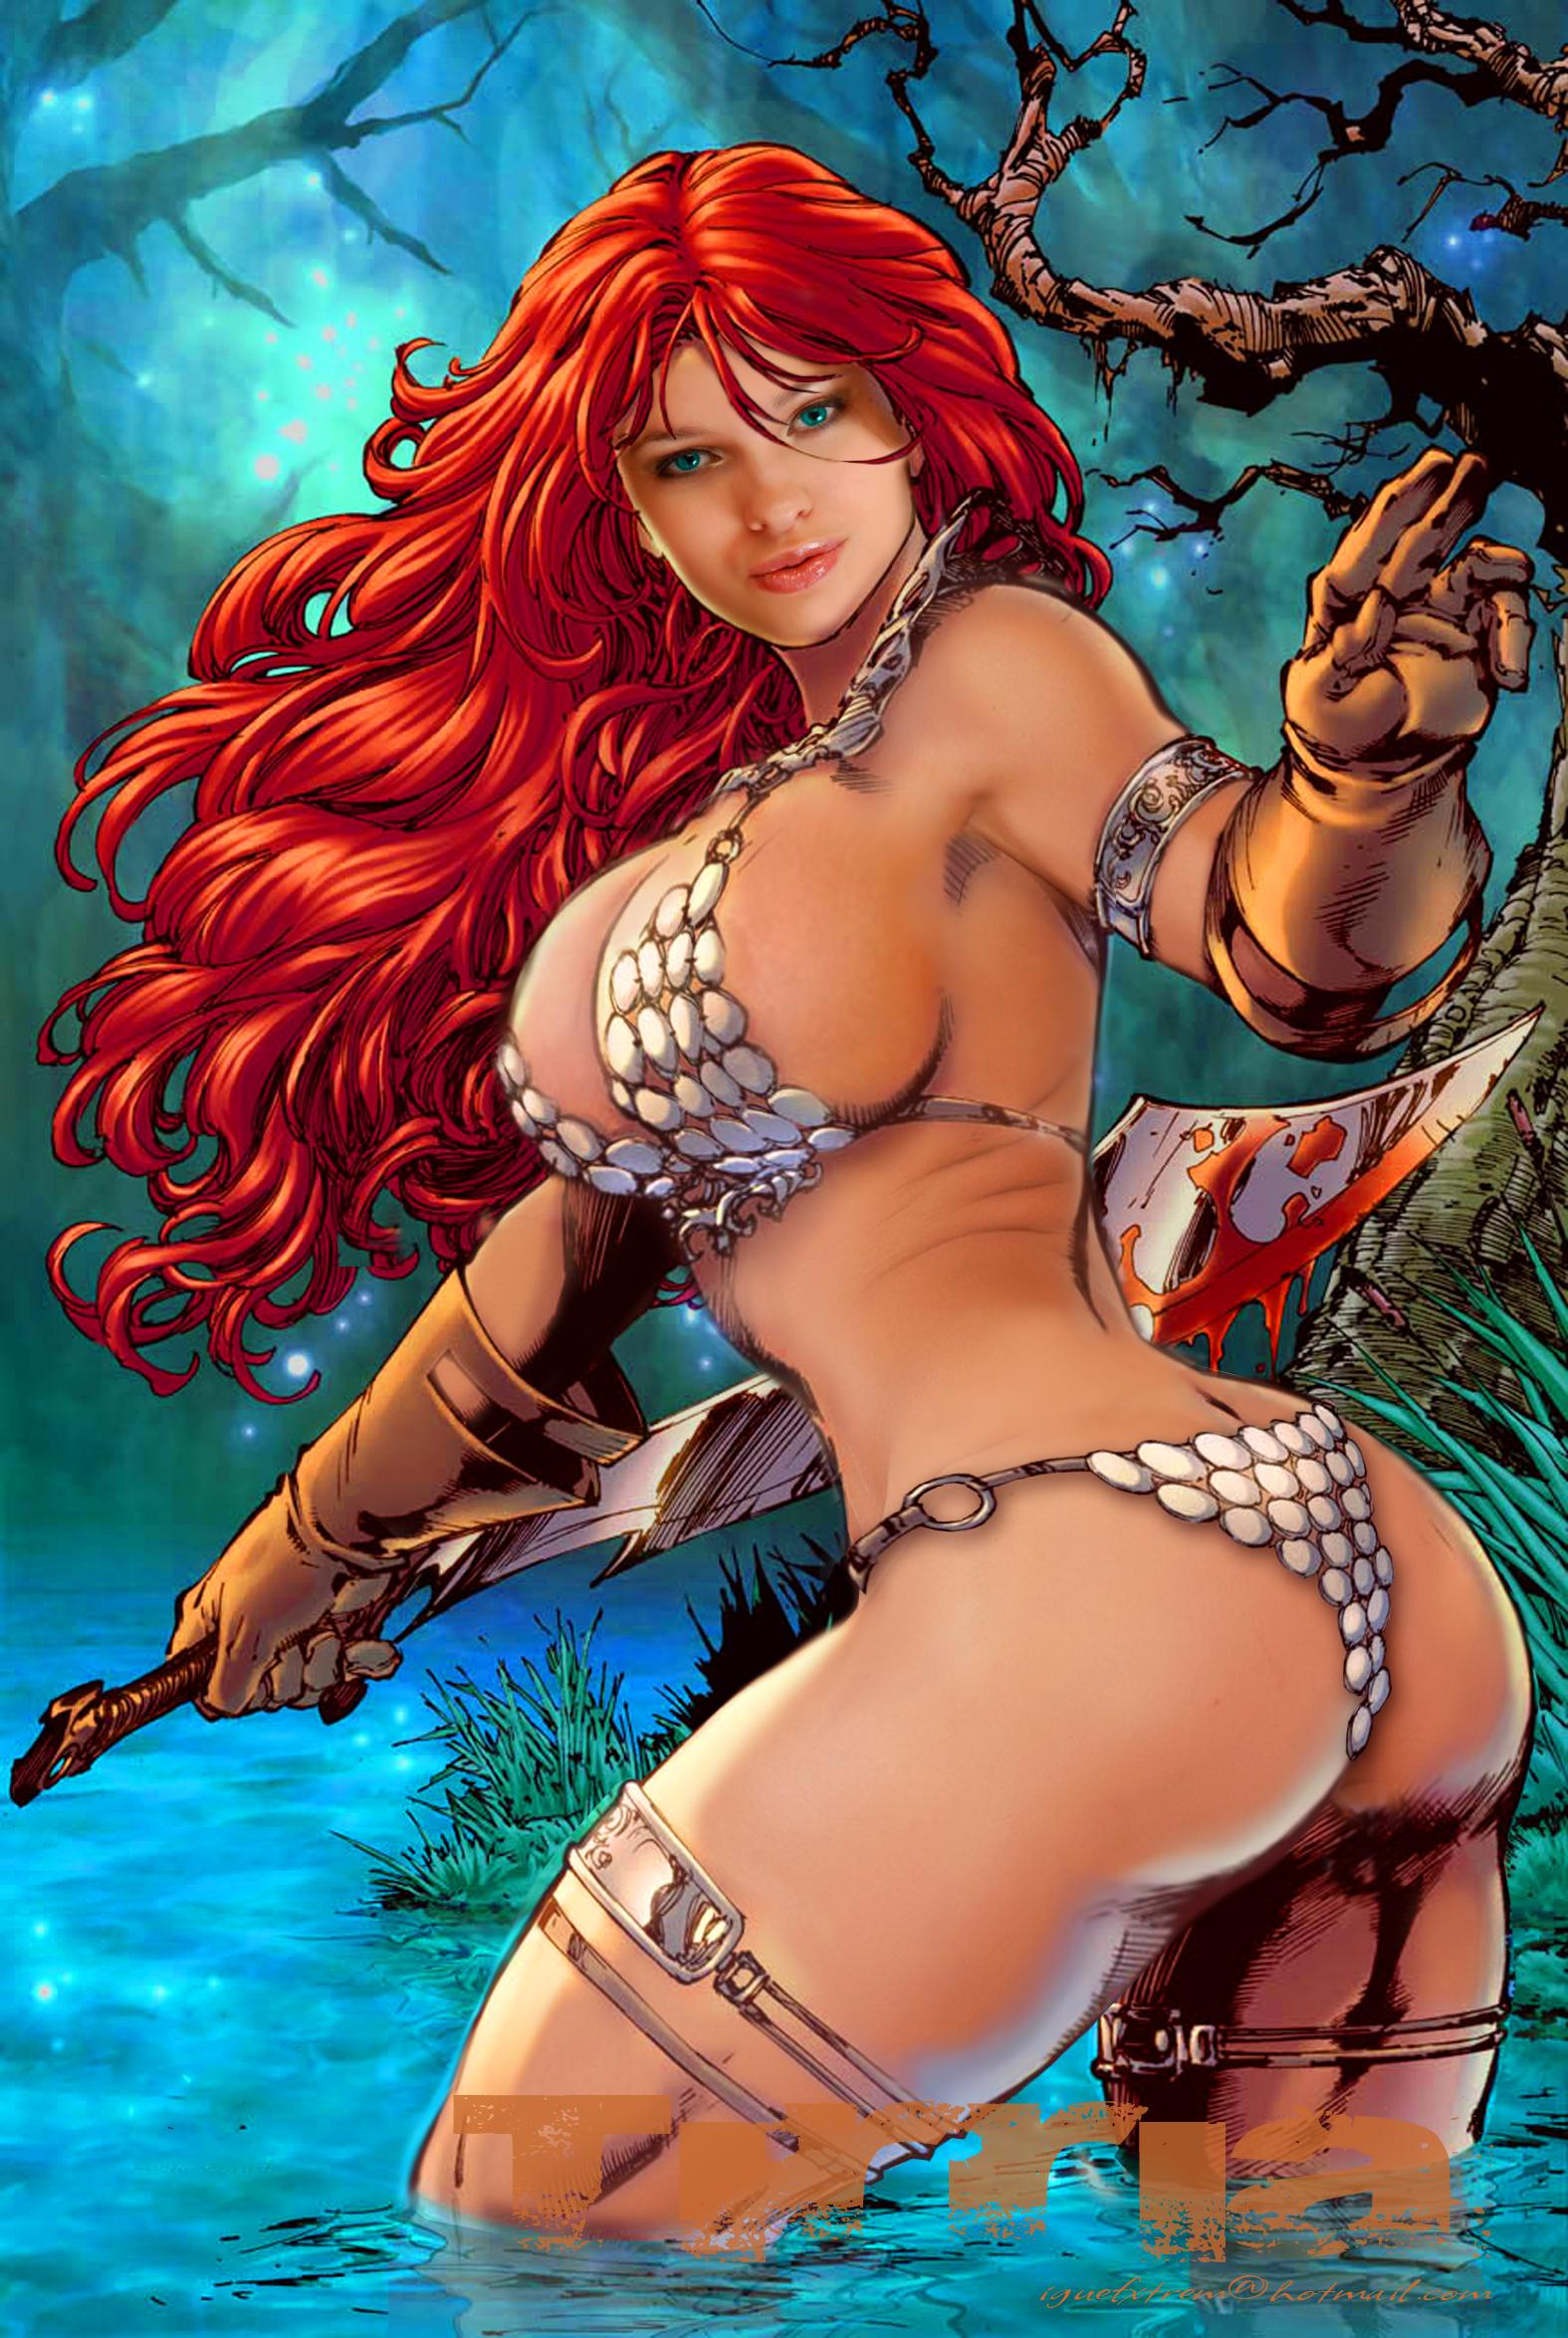 Sexy red sonja comic art